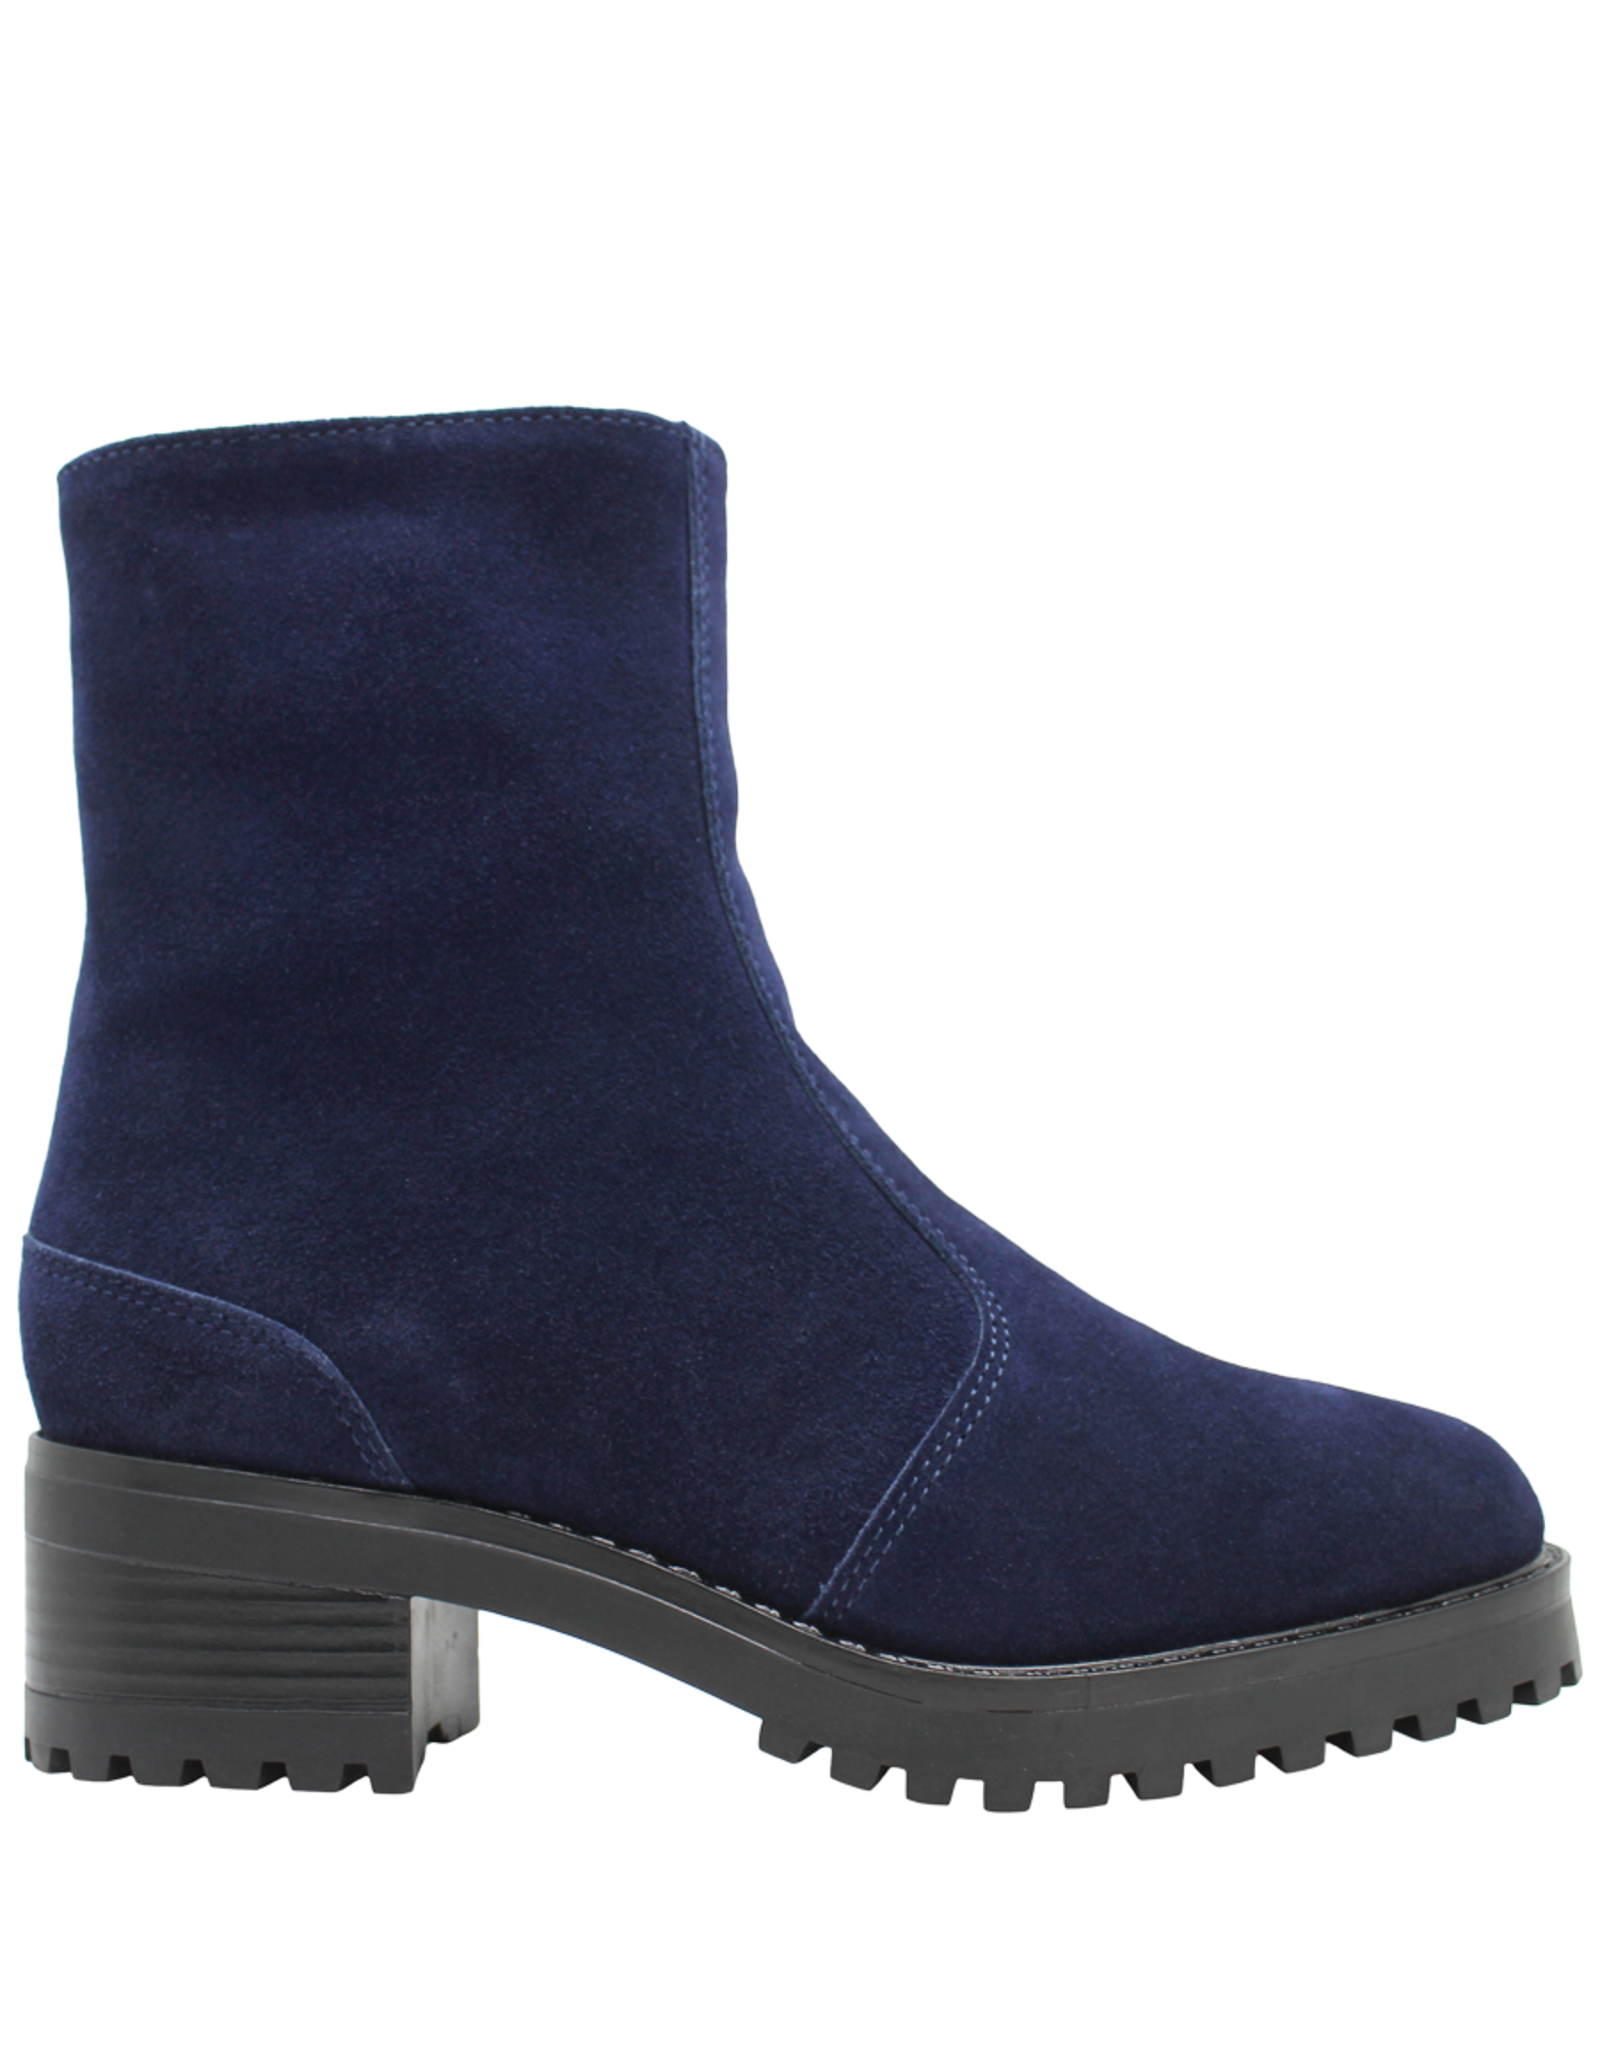 PalmrothOriginal PalmrothOriginals Blue Suede Side Zipper Waterproof Boot Low Heel 8316